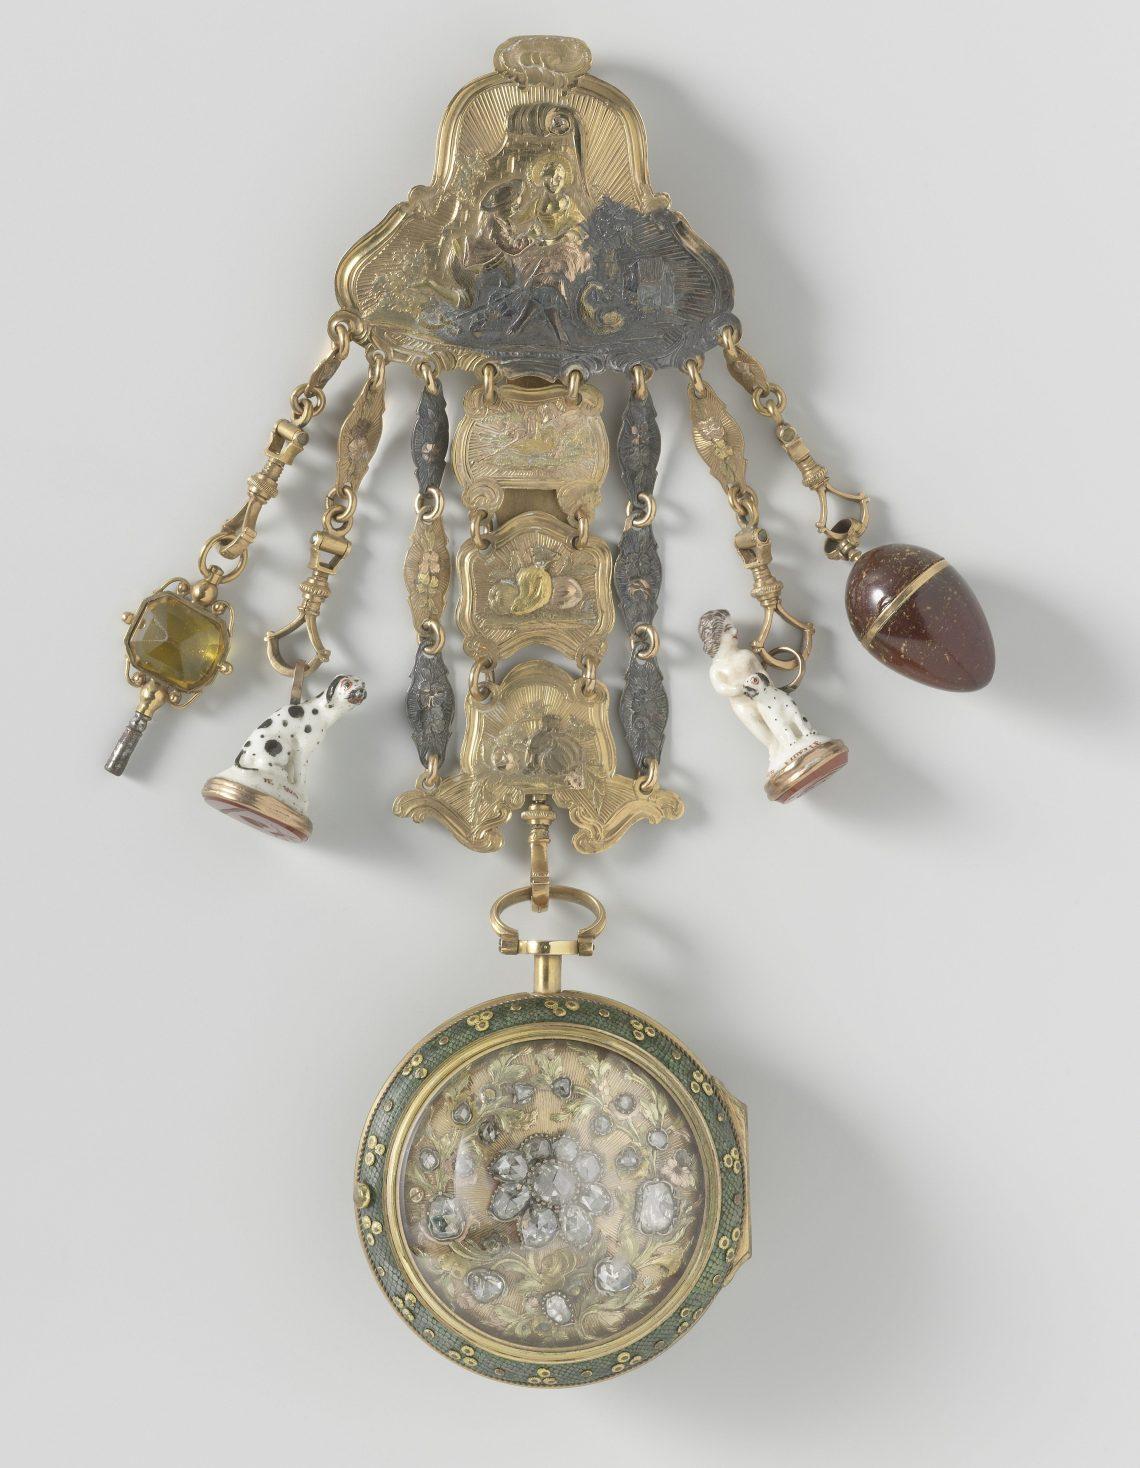 Baillon en Dequay, horloge, circa 1755. Collectie Rijksmuseum, BK-NM-11238, publiek pomein